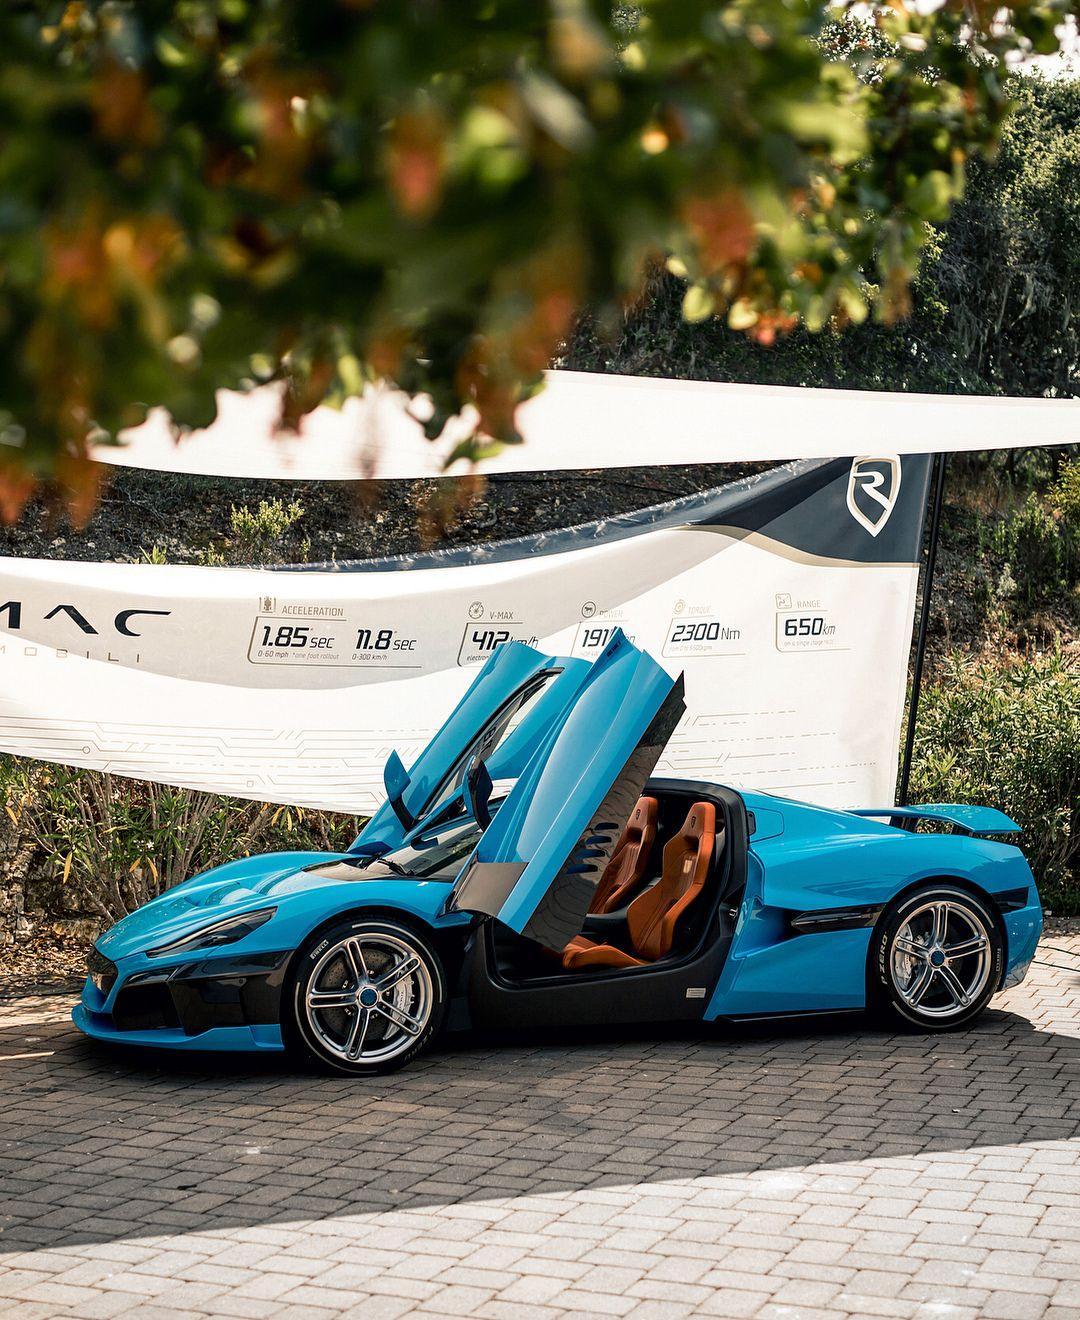 Rimac C Two Photo By Kenozache Rimac Ctwo Concepttwo Rimacctwo Rimacconcepttwo Petrolmadness Best Luxury Cars Luxury Cars Blue Car